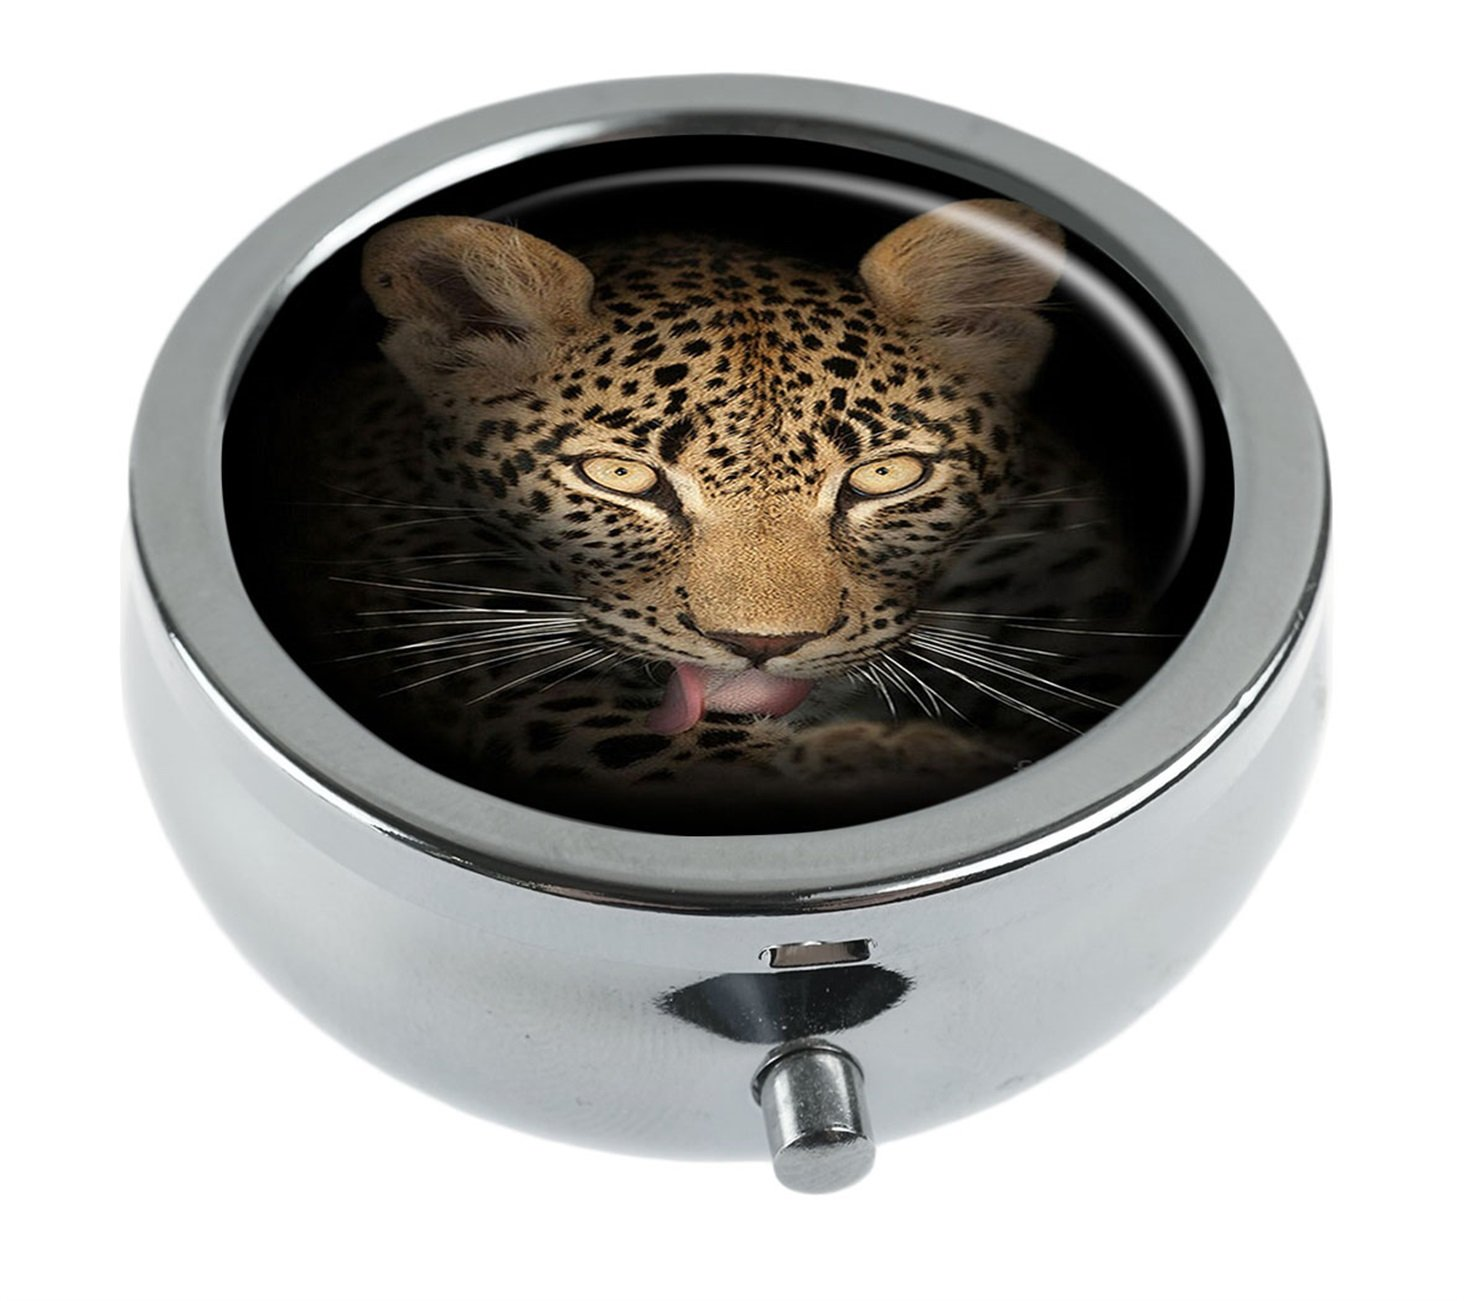 Hiuyi Leopard In The Dark Custom Personalized Round Pill Box Pocket Wallet Travel Pill Vitamin Decorative Box Protector